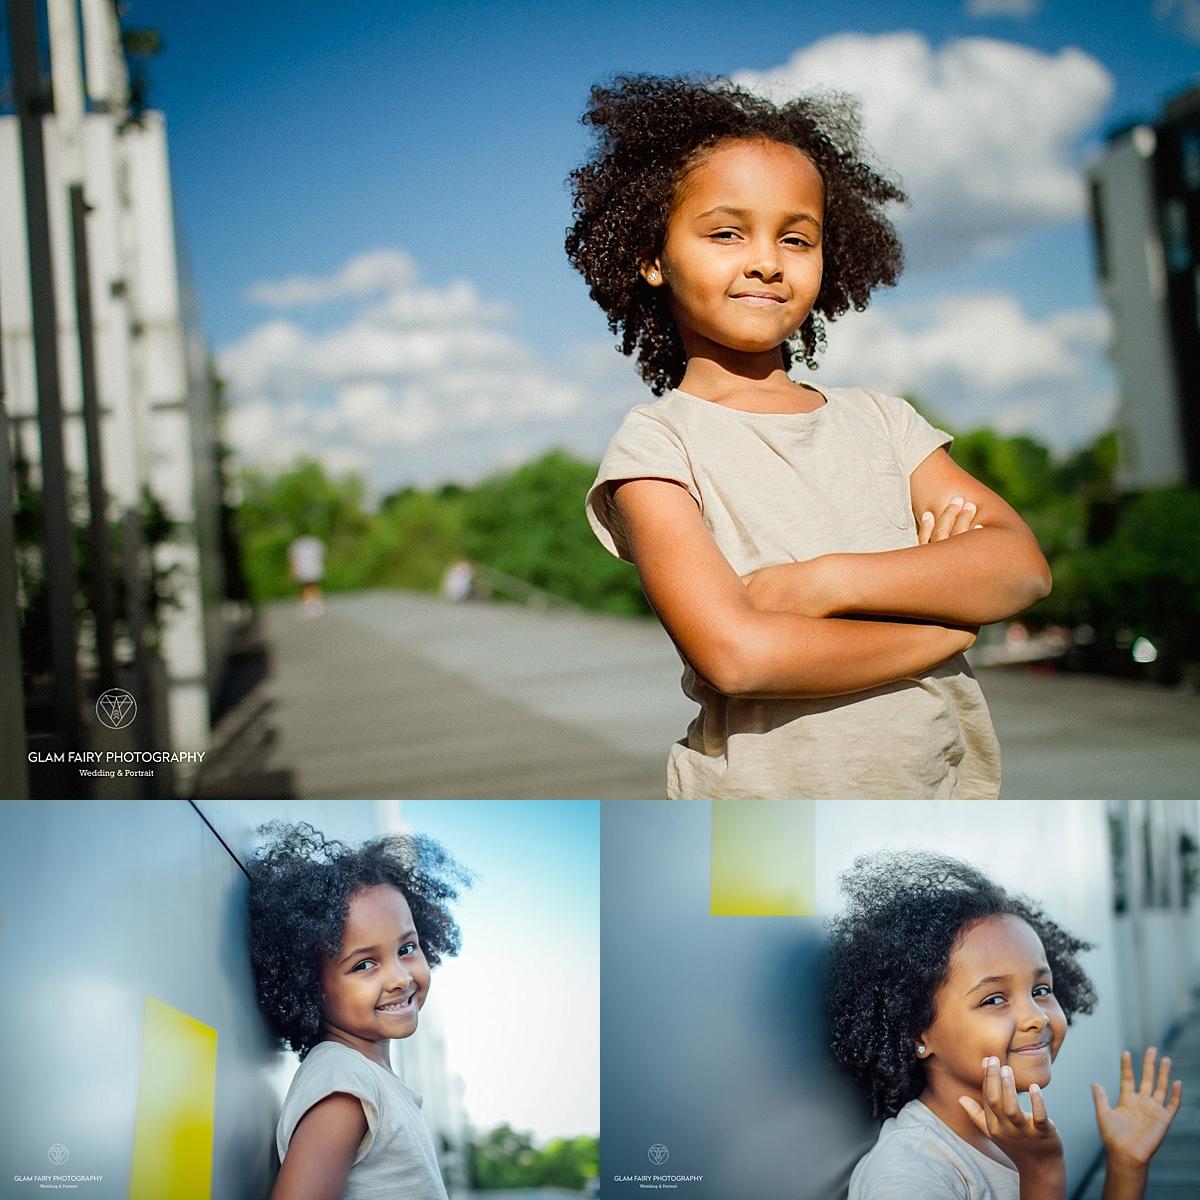 GlamFairyPhotography-séance-photo-enfant-bnf-yaelle_0006